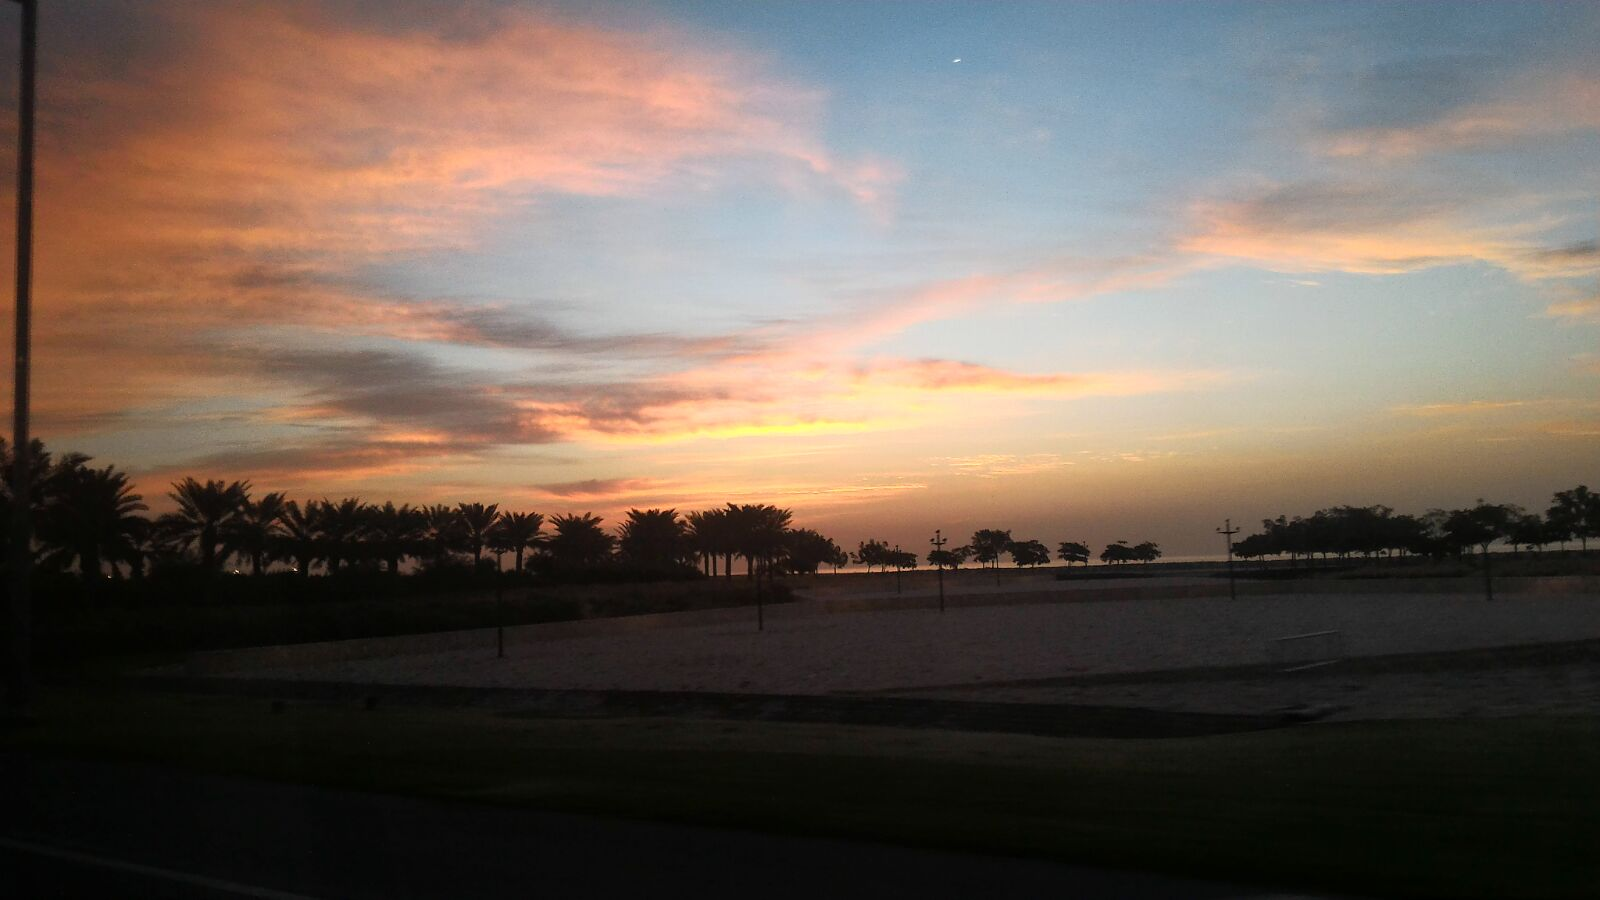 hajnal_a_sivatagban.jpeg